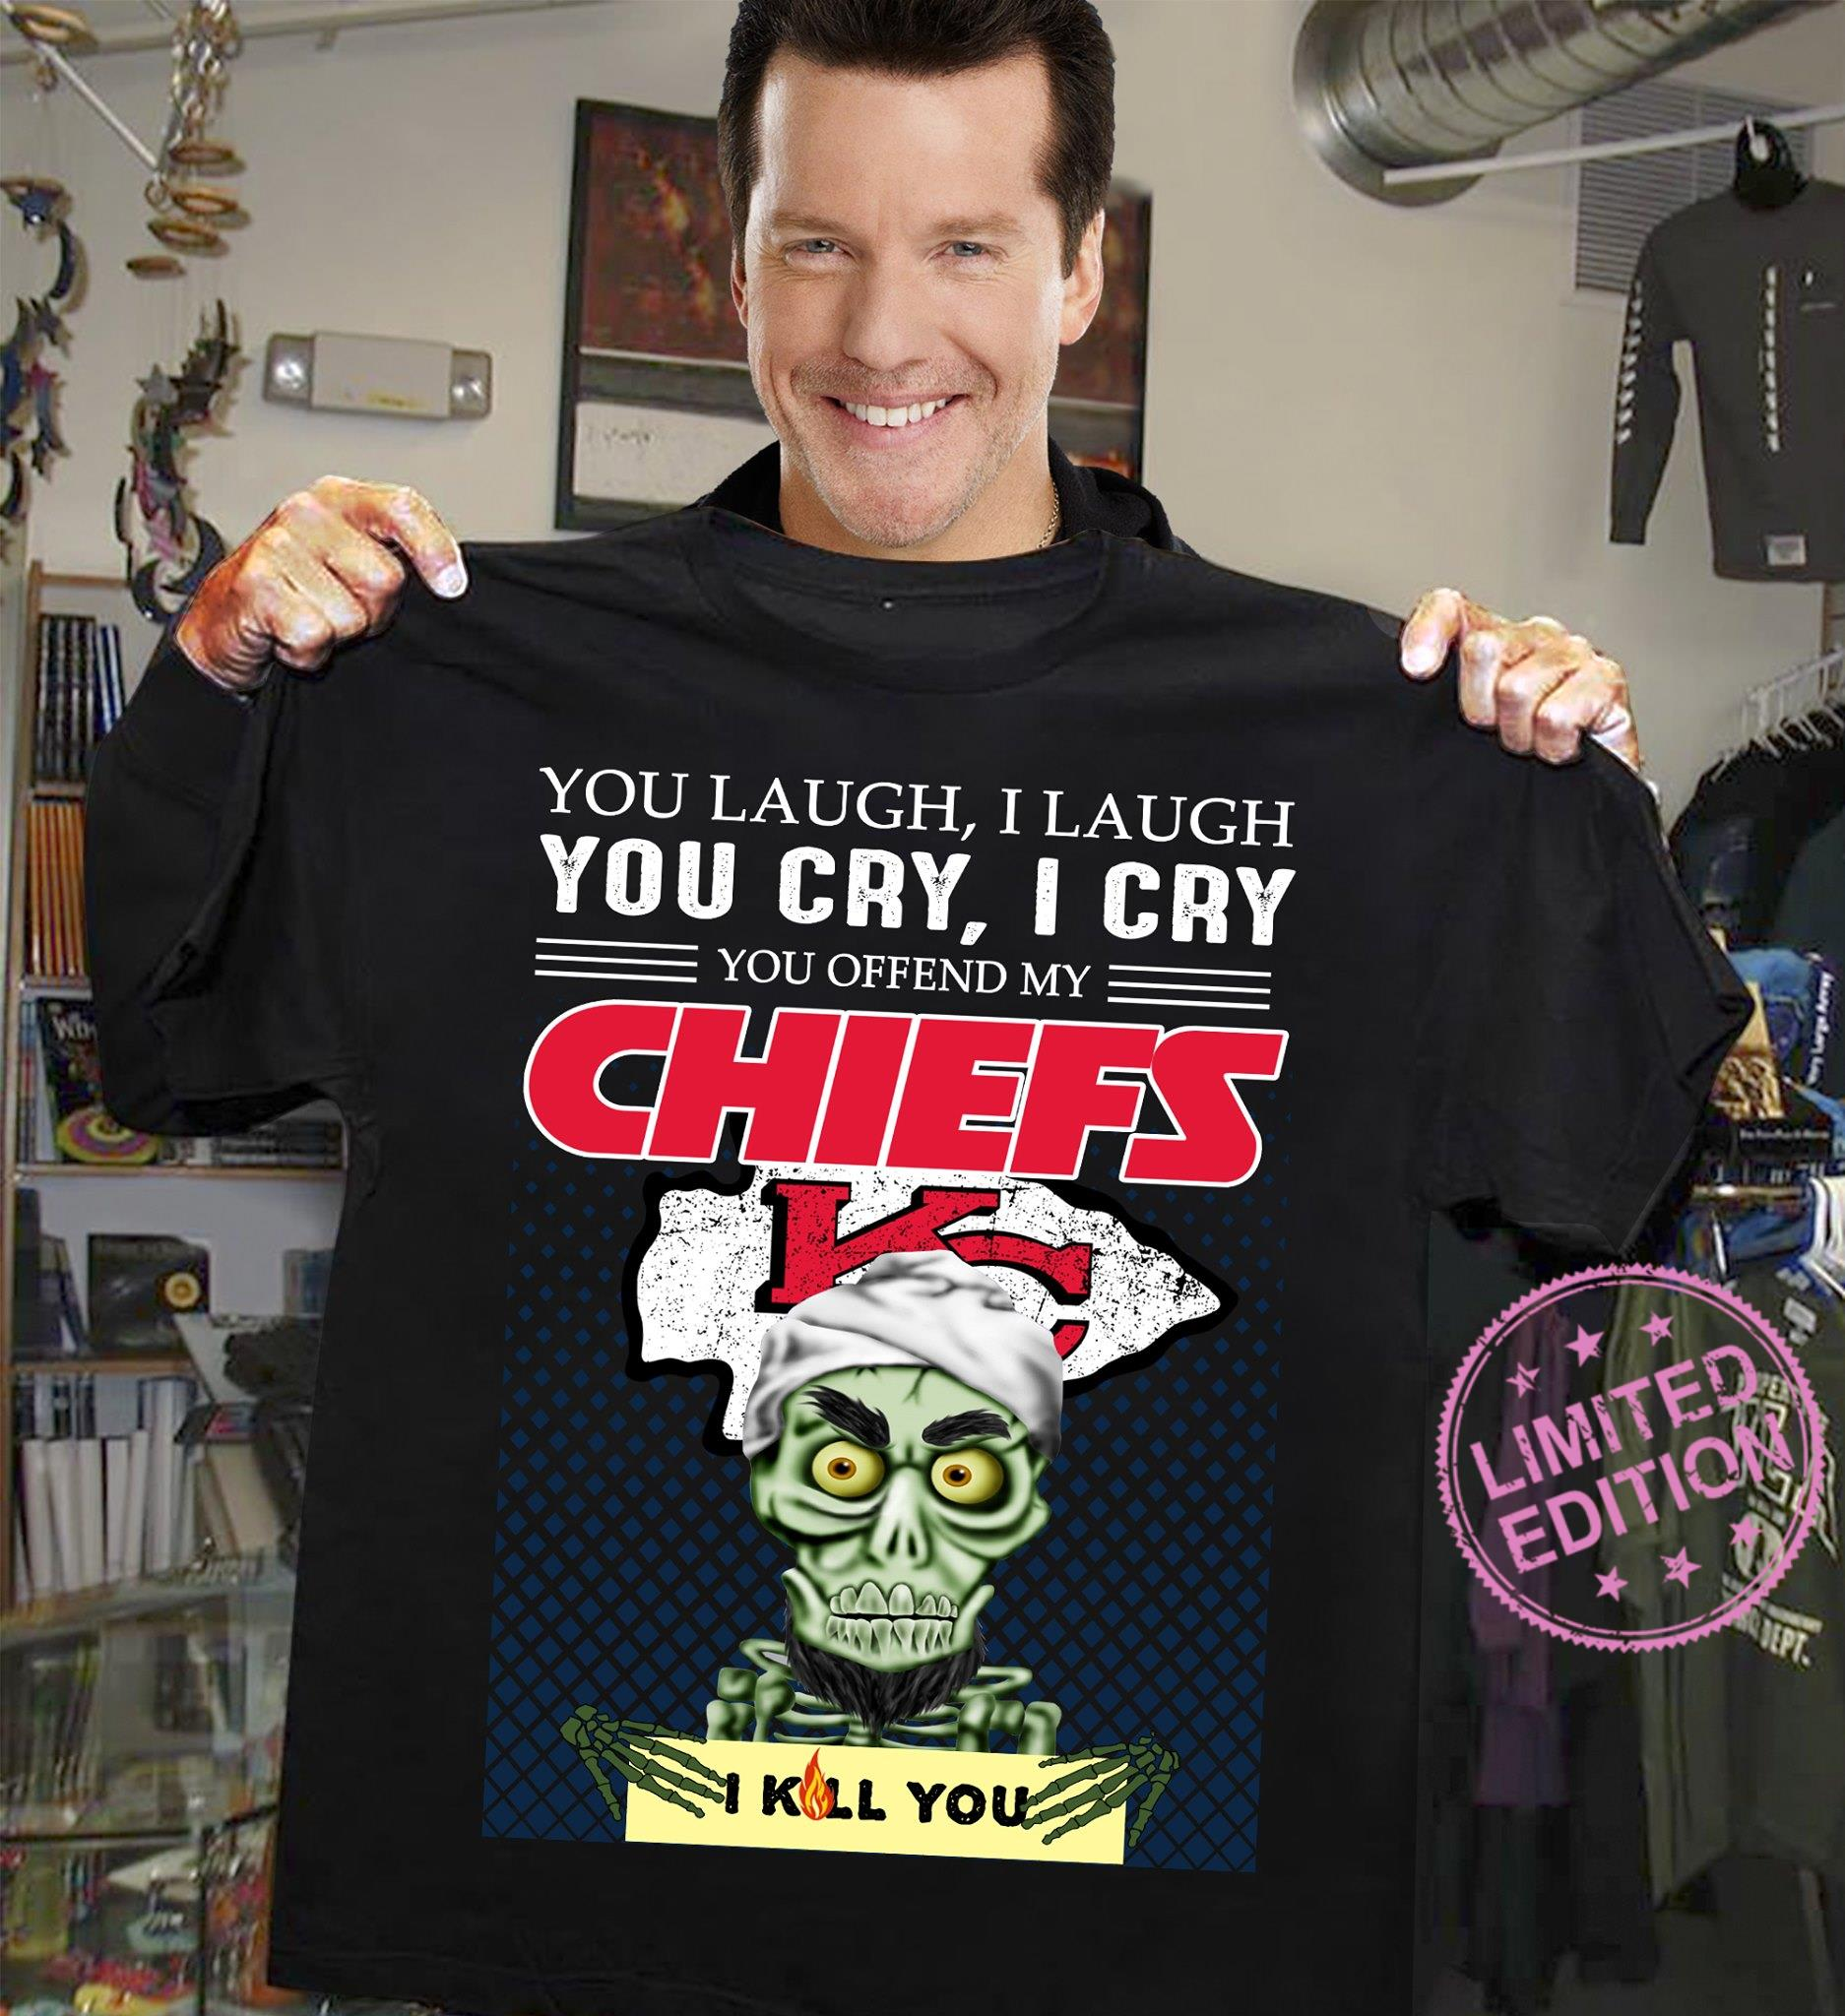 You laugh i laugh you cry i cry you offend my chiefs i kill you shirt